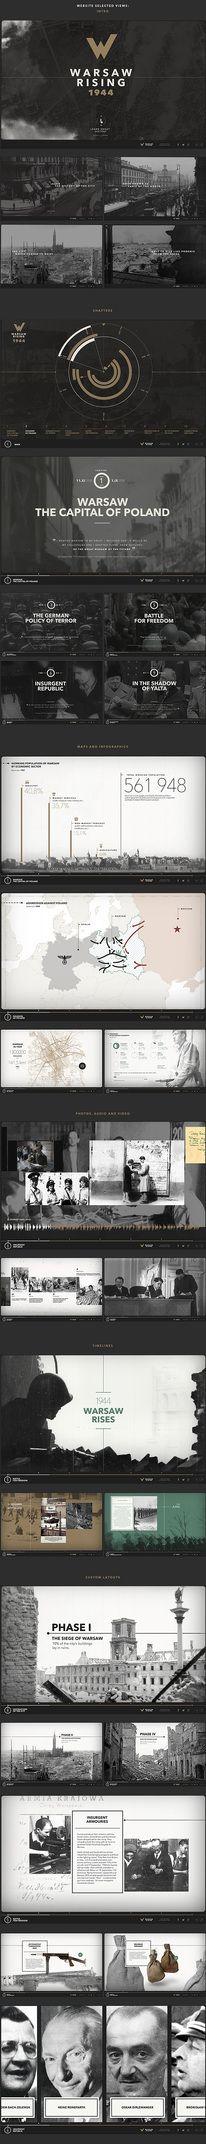 Roandco curatorsconference 04 1299 xxx q85 bede3de — Designspiration